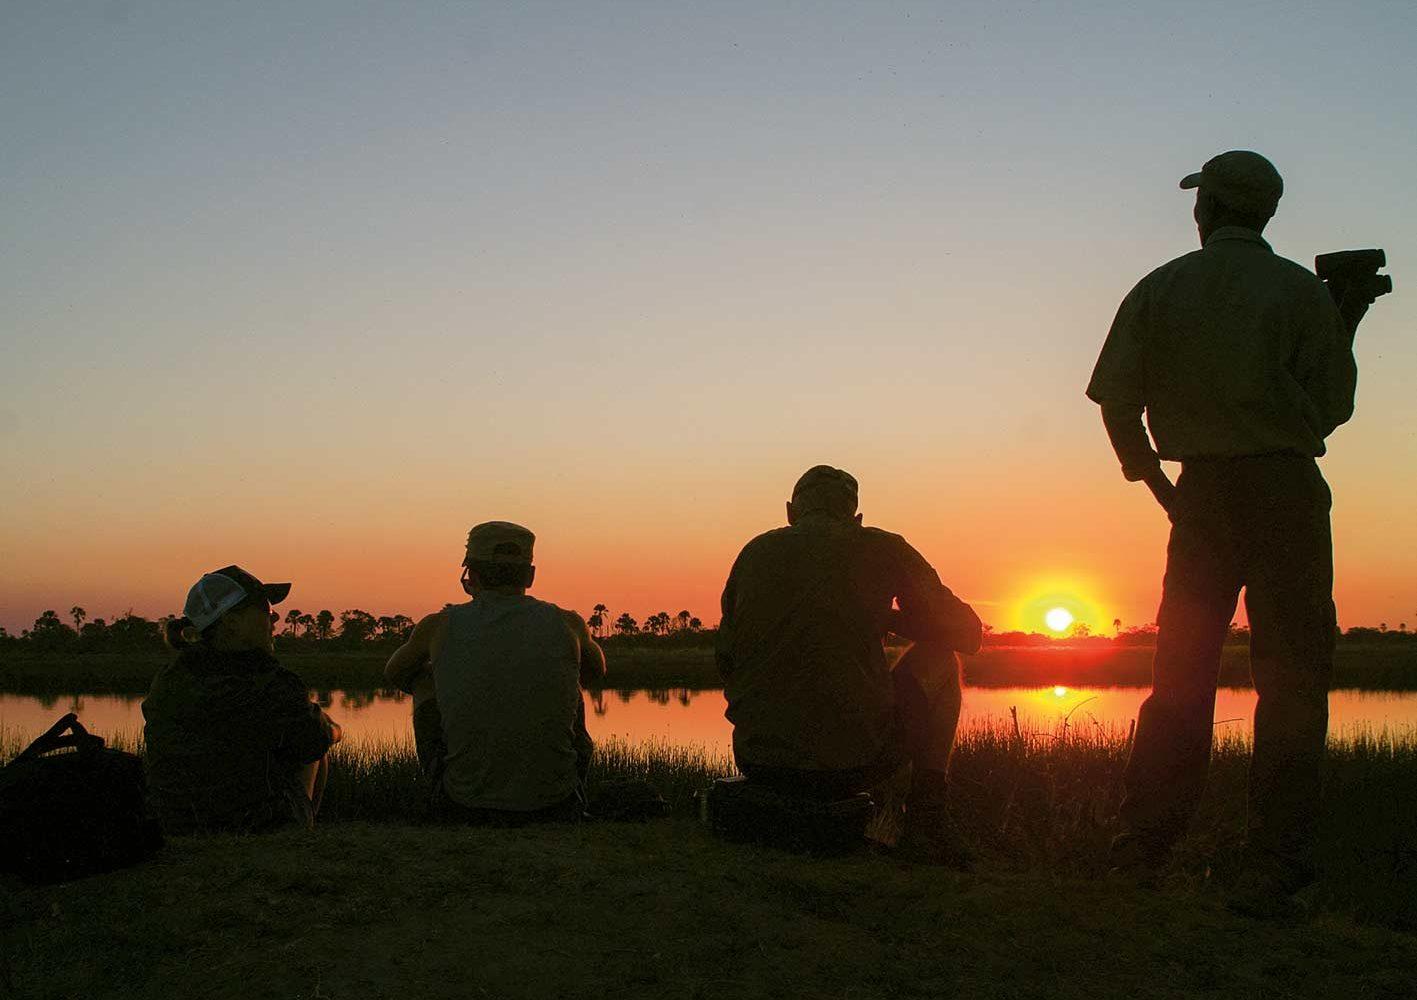 Sundowner im Okawango-Delta, Botswana